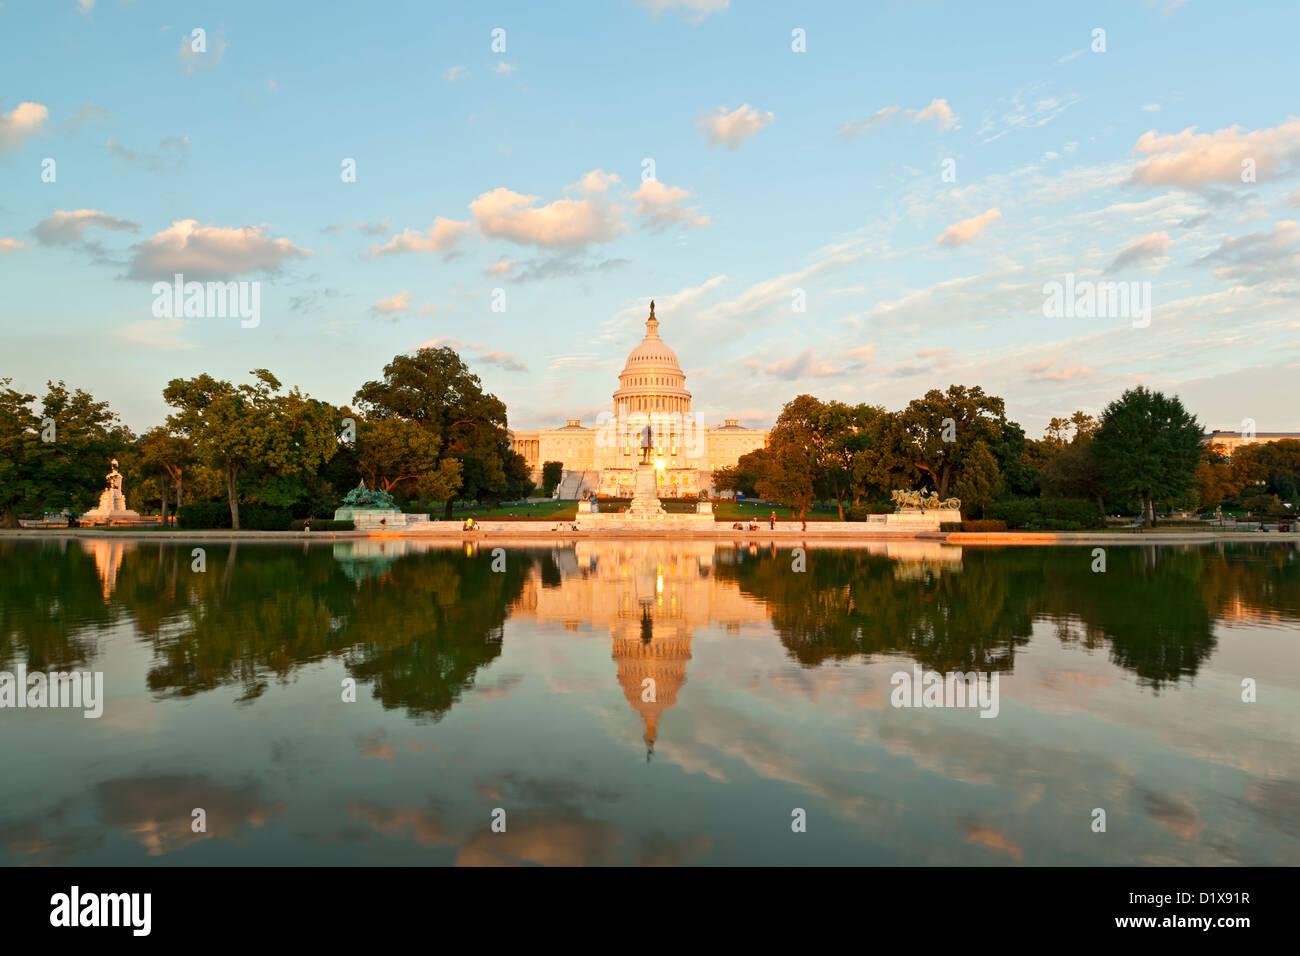 U.S. Capitol Building and Capitol Reflecting Pool, Washington, DC USA - Stock Image